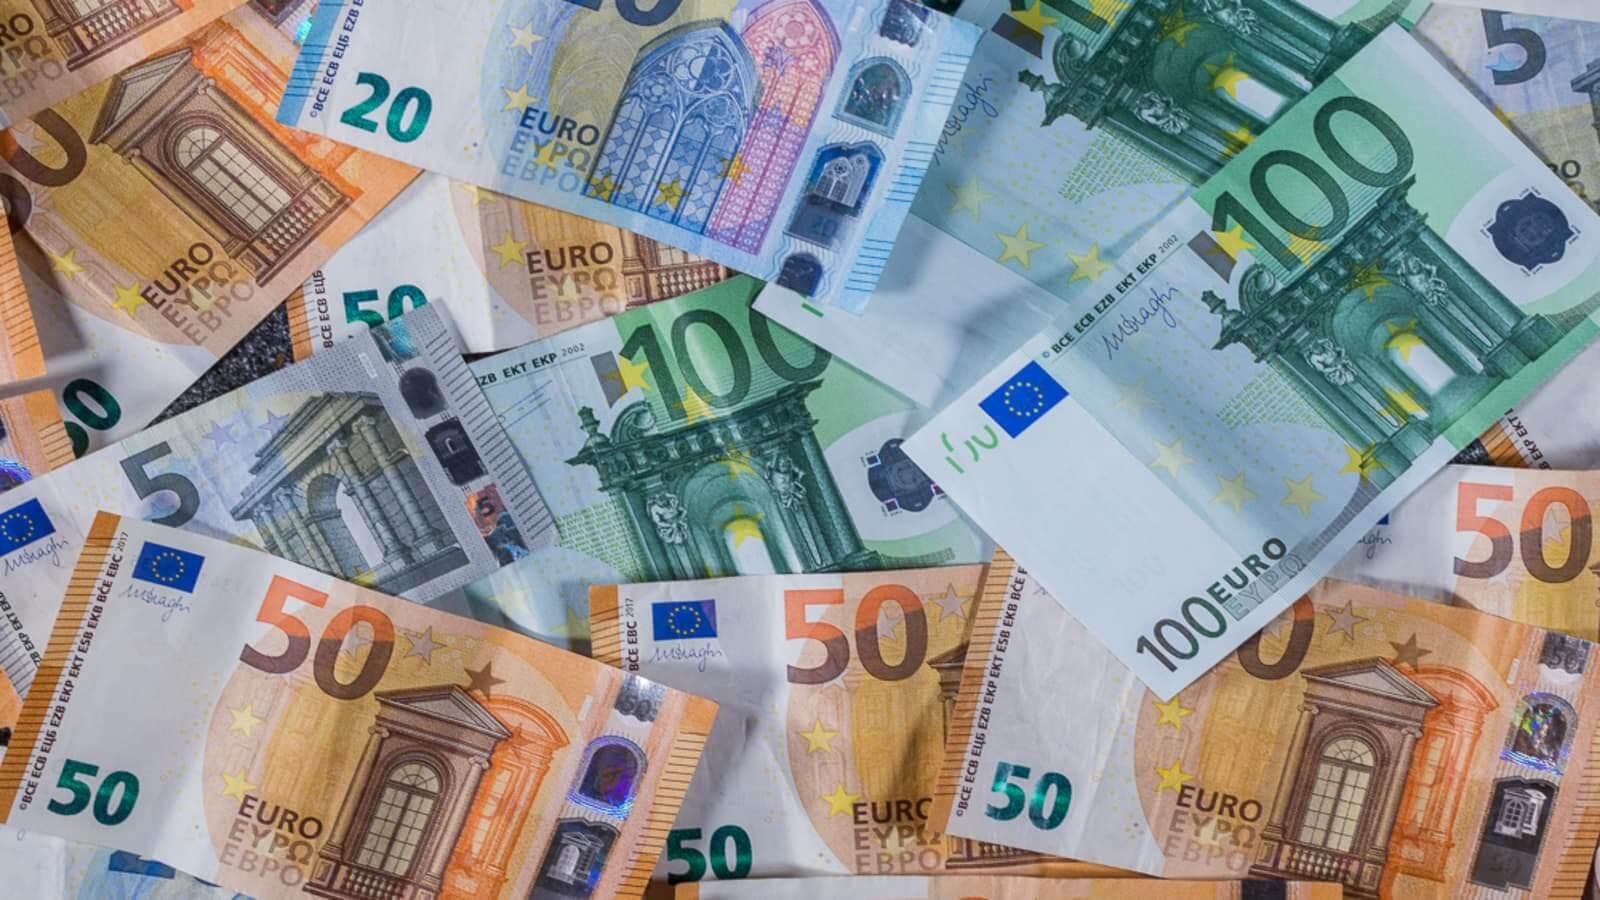 банкноты евро деньги монеты